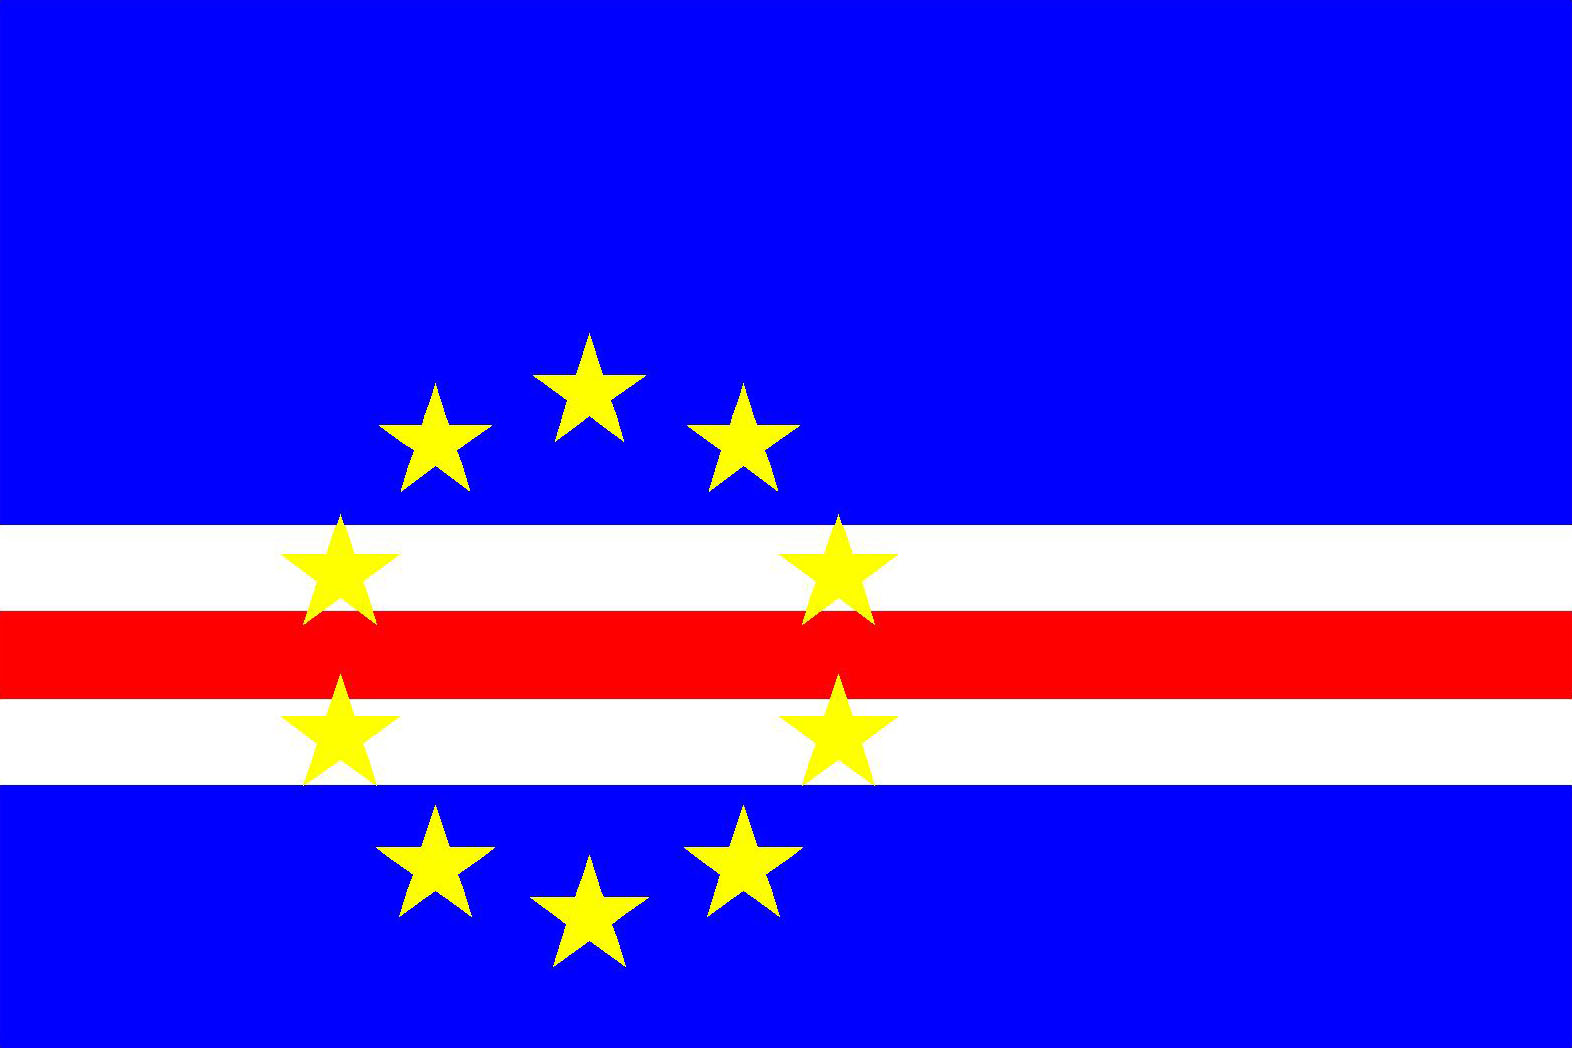 Cape_Verde_flag_-_watermark_000_percent.